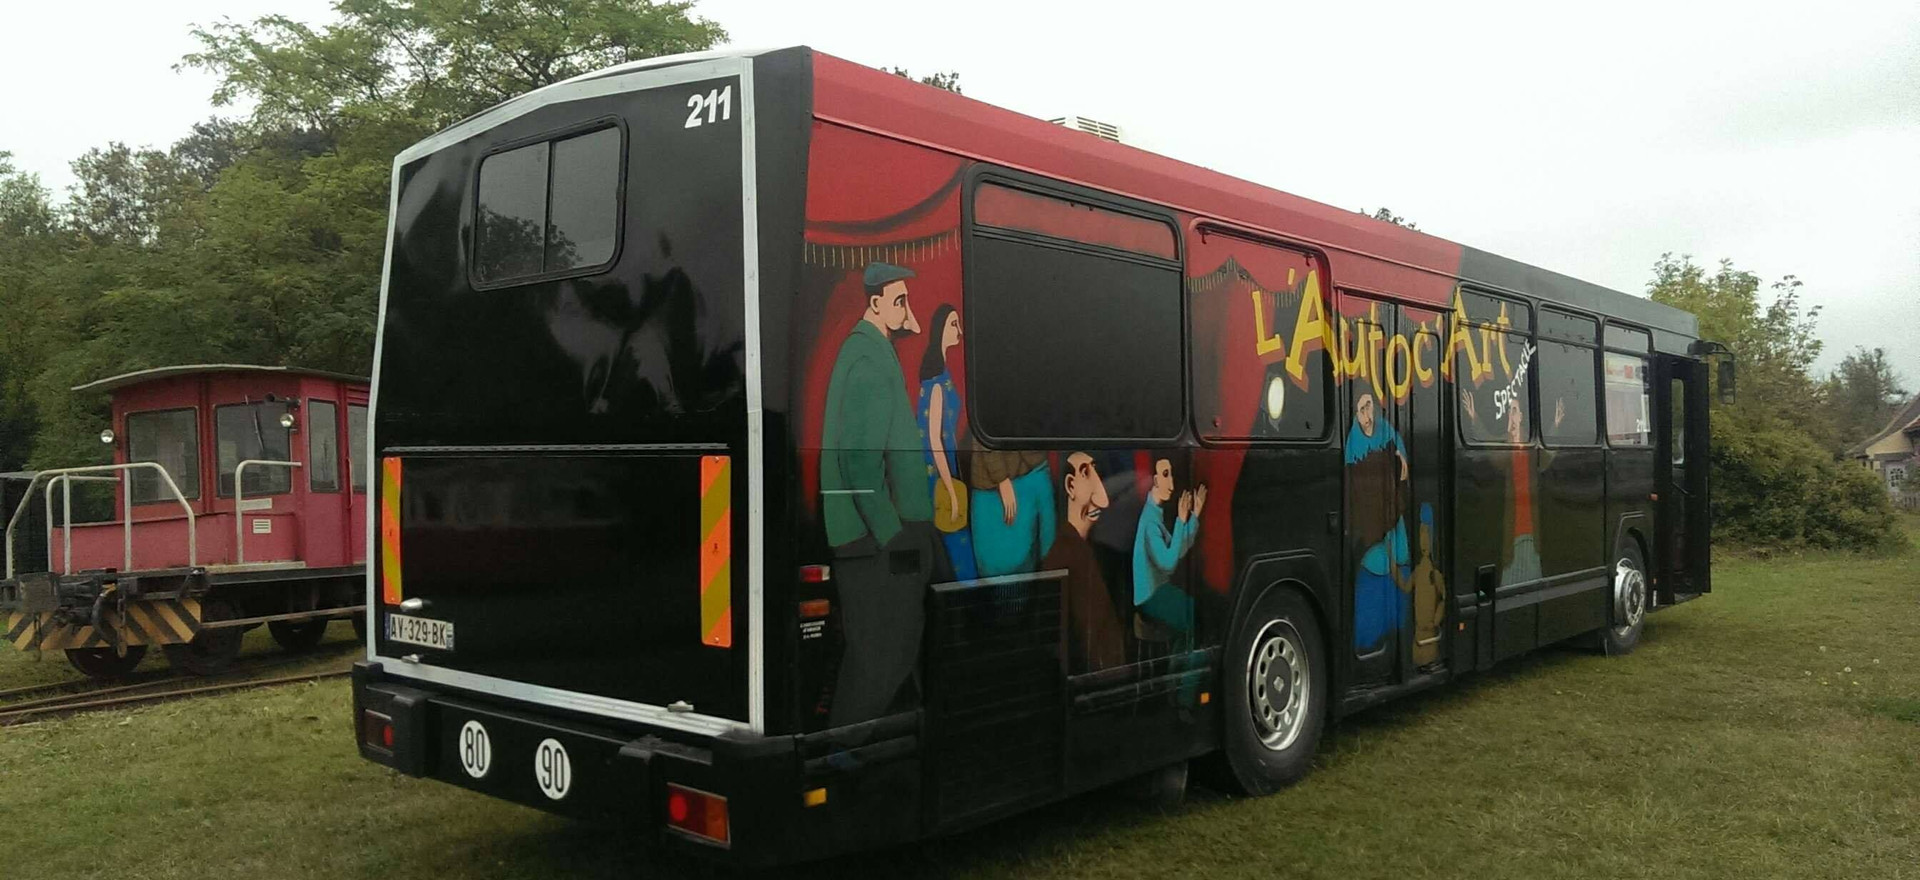 L'autobus théatre 211